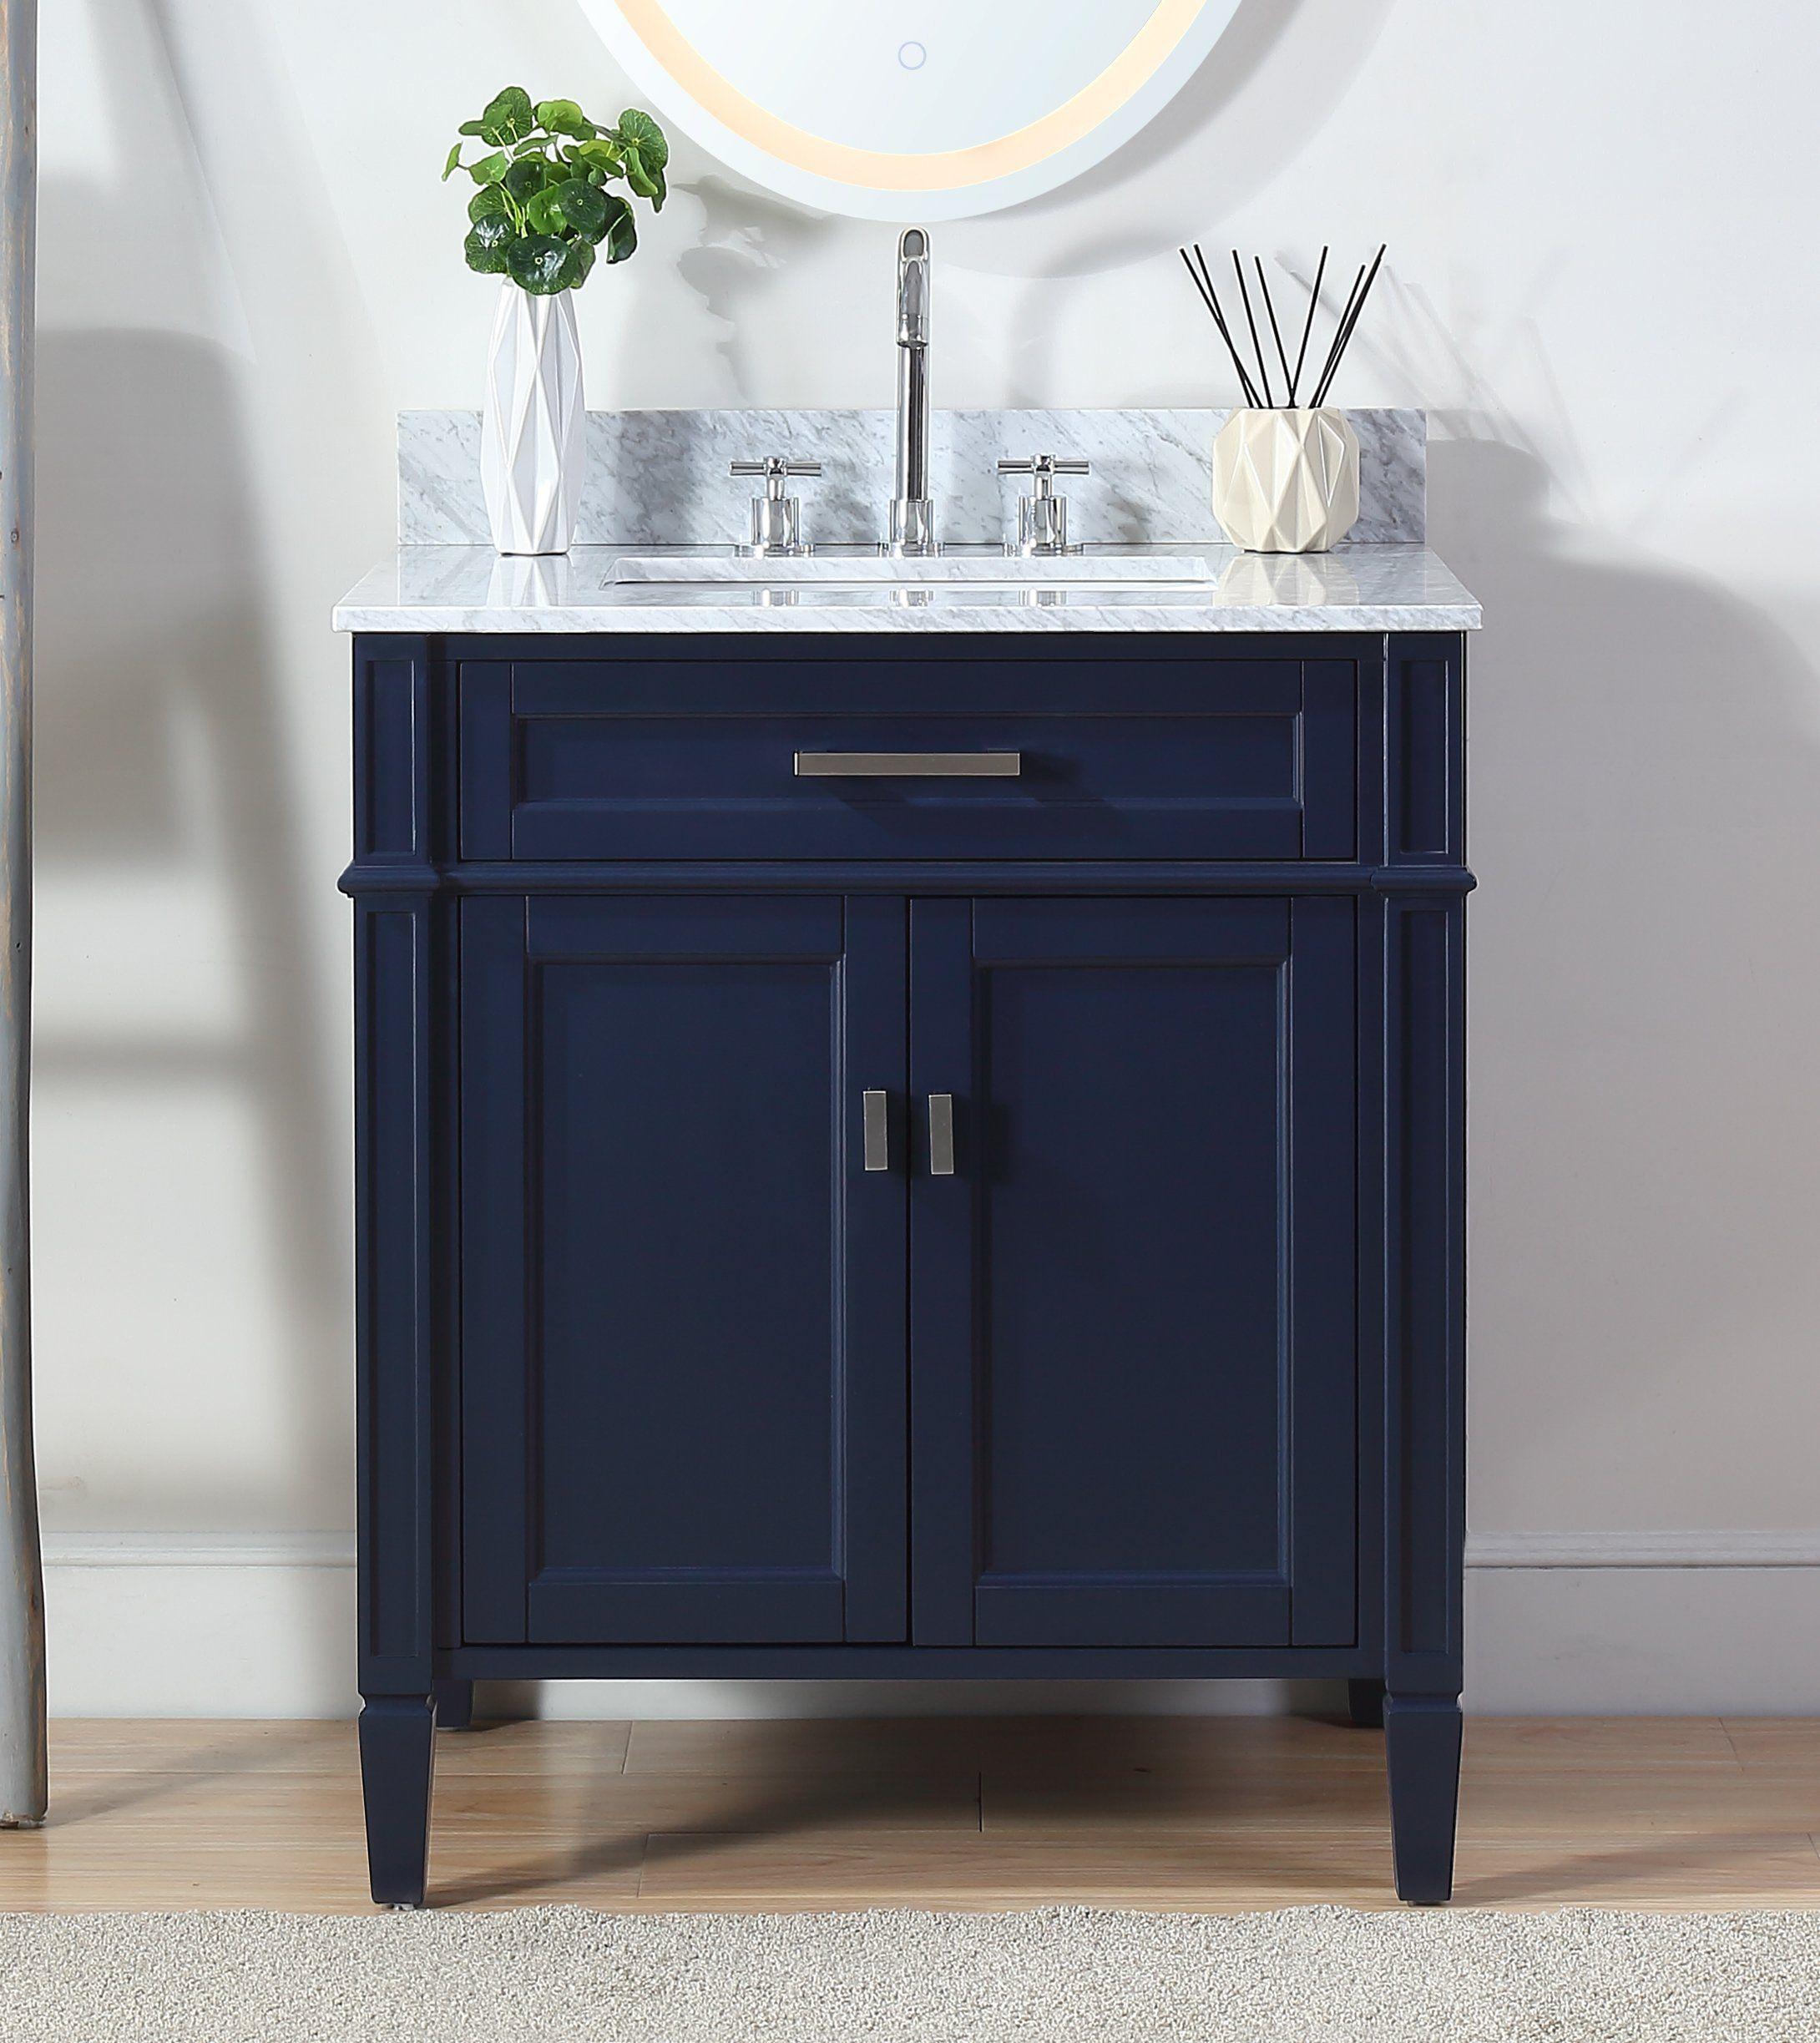 Chans Furniture Zk 1808 V30nb Tennant Durand 30 Freestanding Modern Style Bathroom Vanity In Navy Blue Modern Style Bathroom Blue Modern Bathrooms Bathroom Sink Vanity